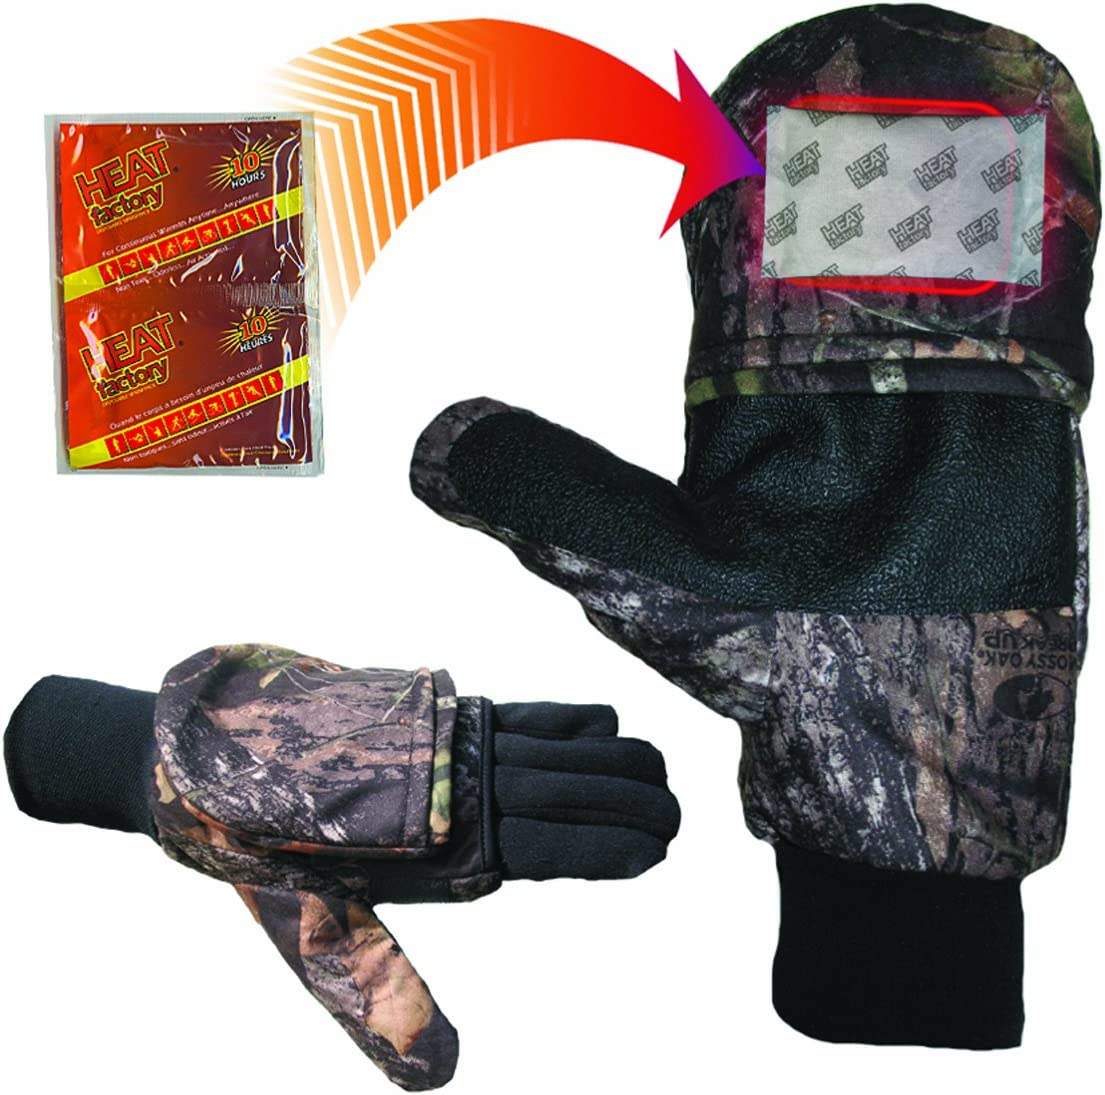 Heat Factory Gloves